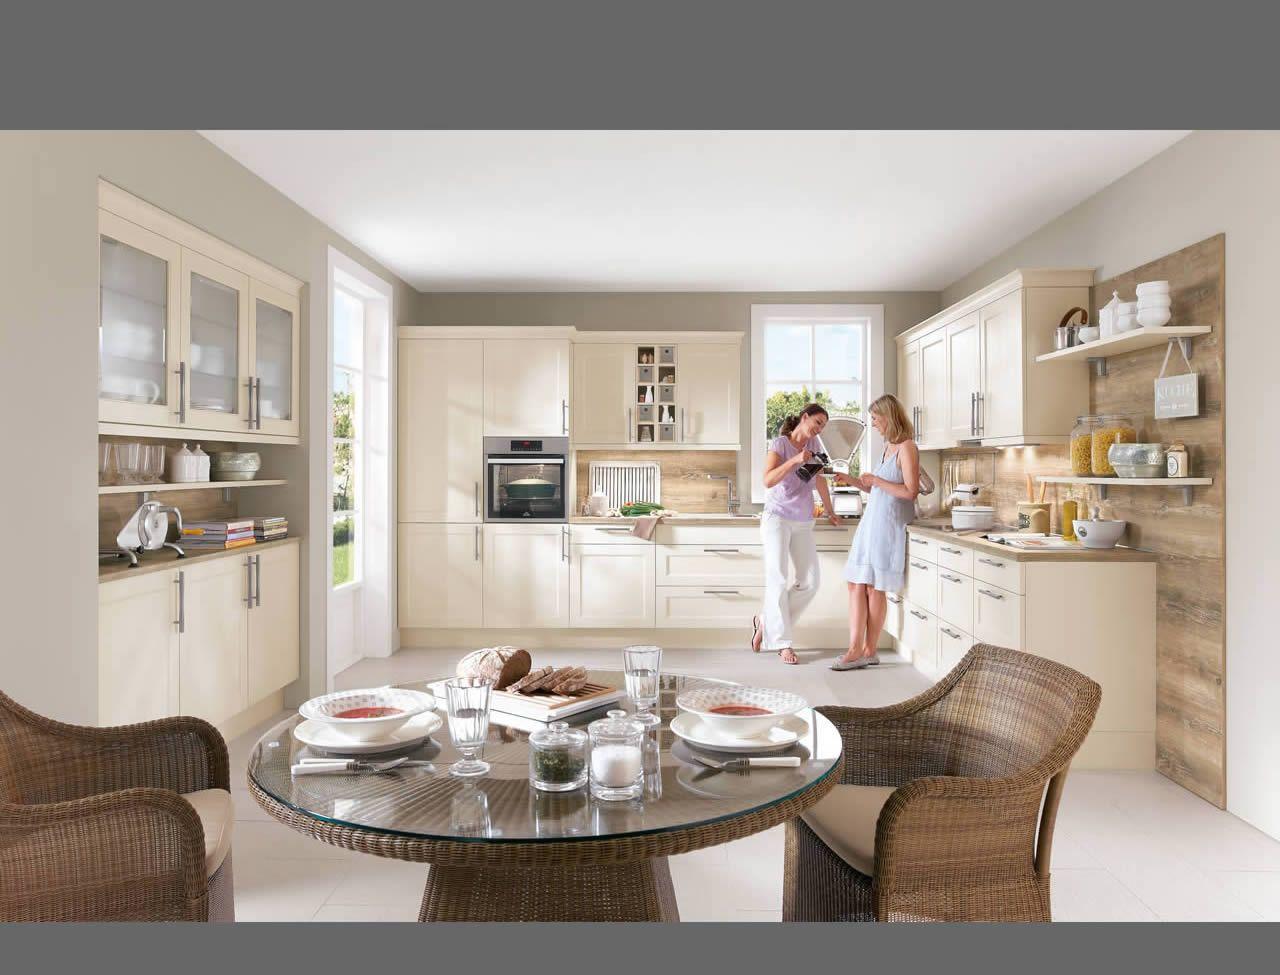 nobilia chalet 883 lack magnolia matt k che pinterest helle farben wanddesign und. Black Bedroom Furniture Sets. Home Design Ideas